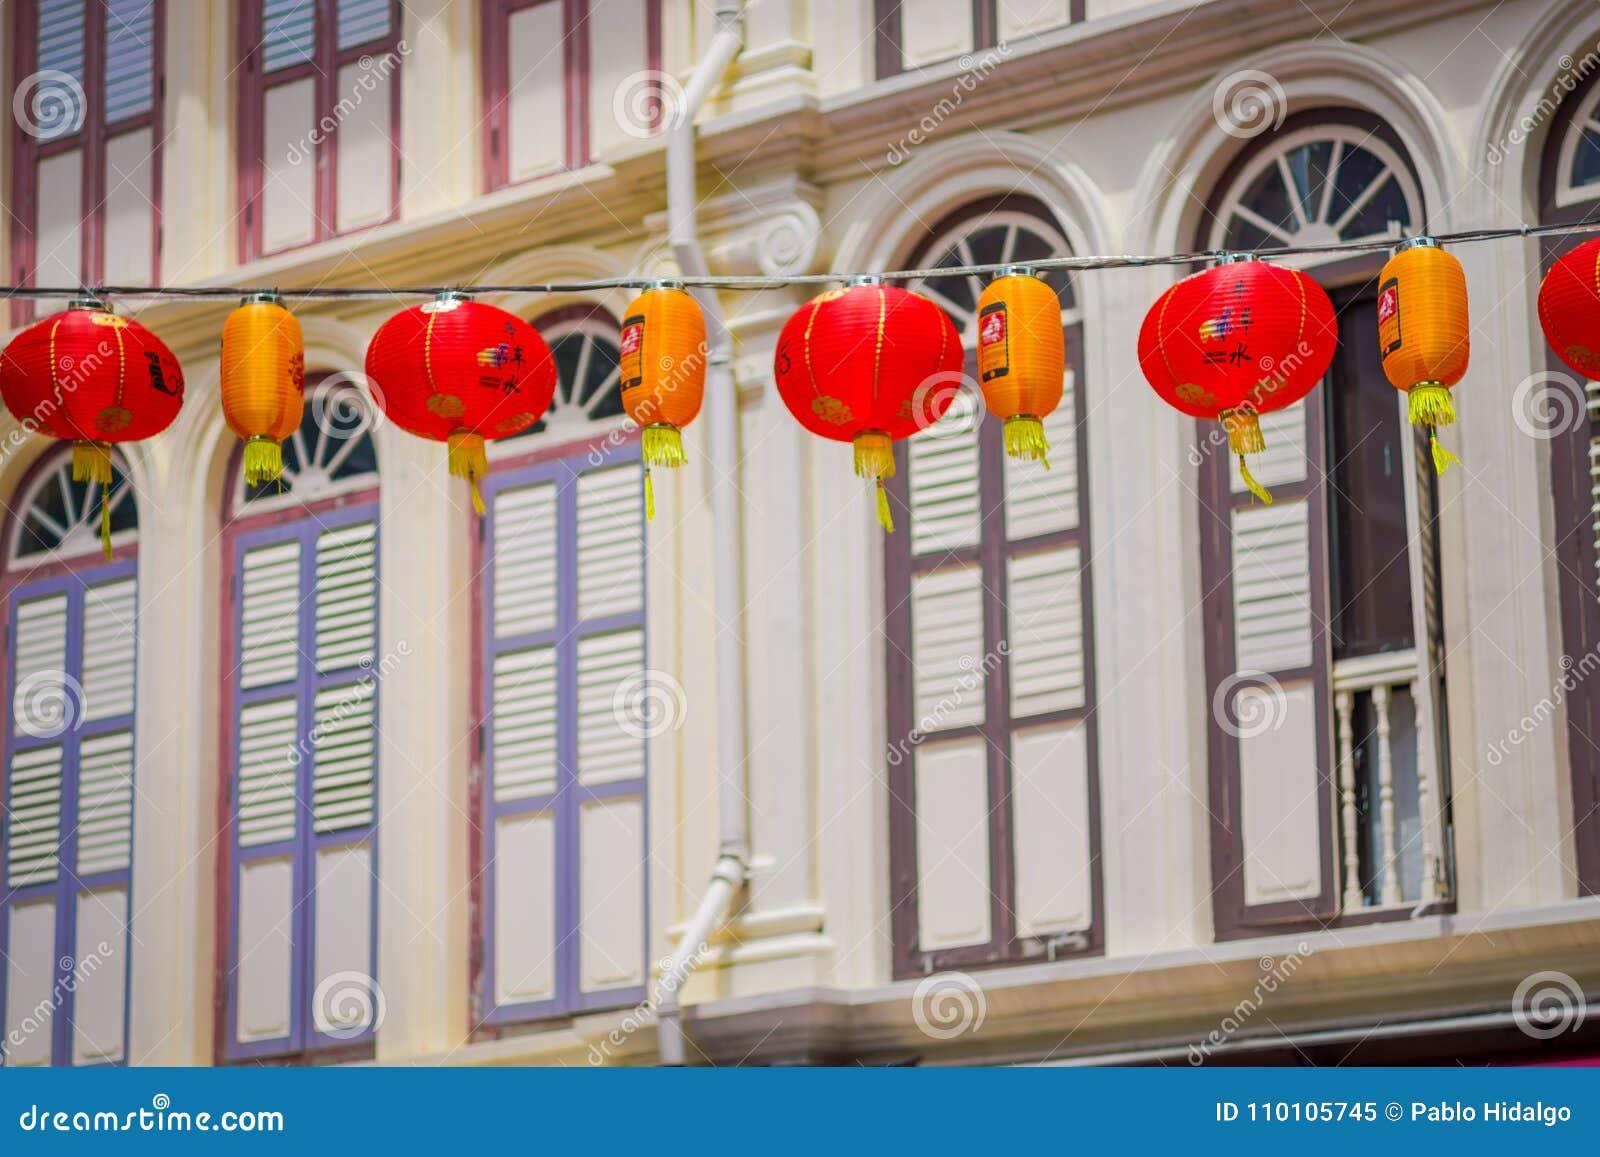 SINGAPORE, SINGAPORE - JANUARY 30. 2018: Close up of decorative lanterns scattered around Chinatown, Singapore. China`s